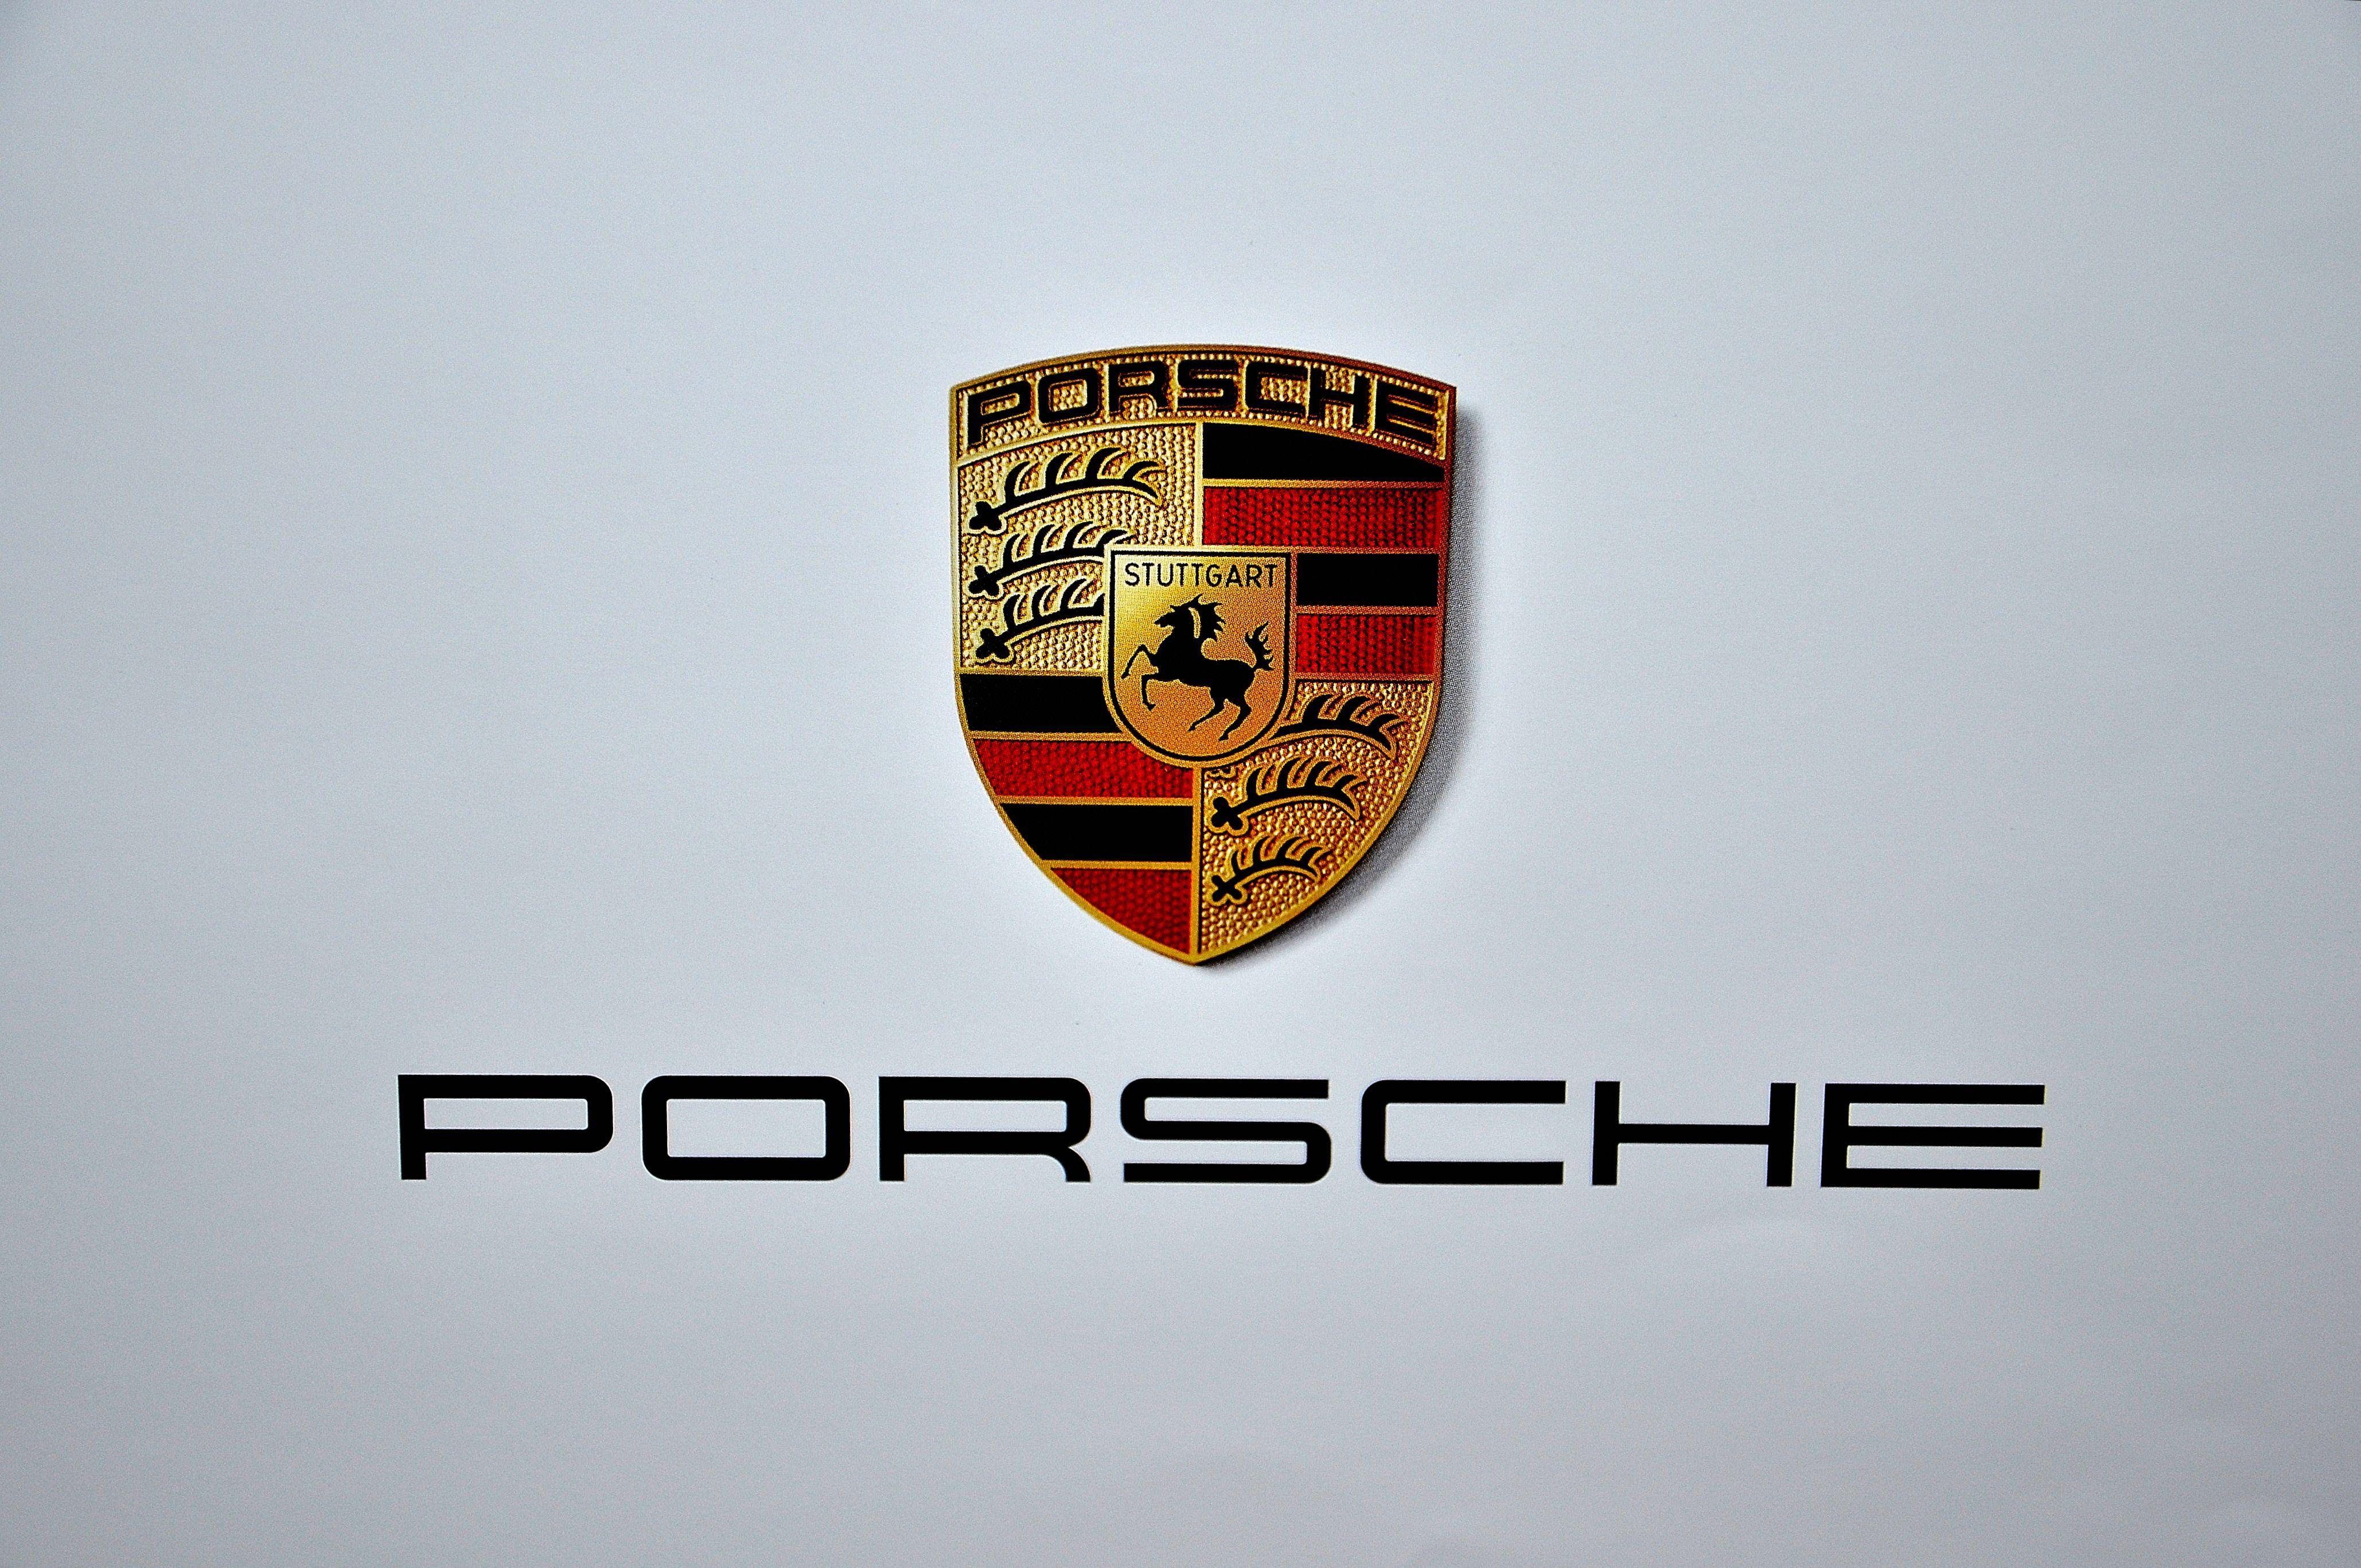 15866 Porsche Logo Wallpaper for Home   WalOpscom 4116x2734